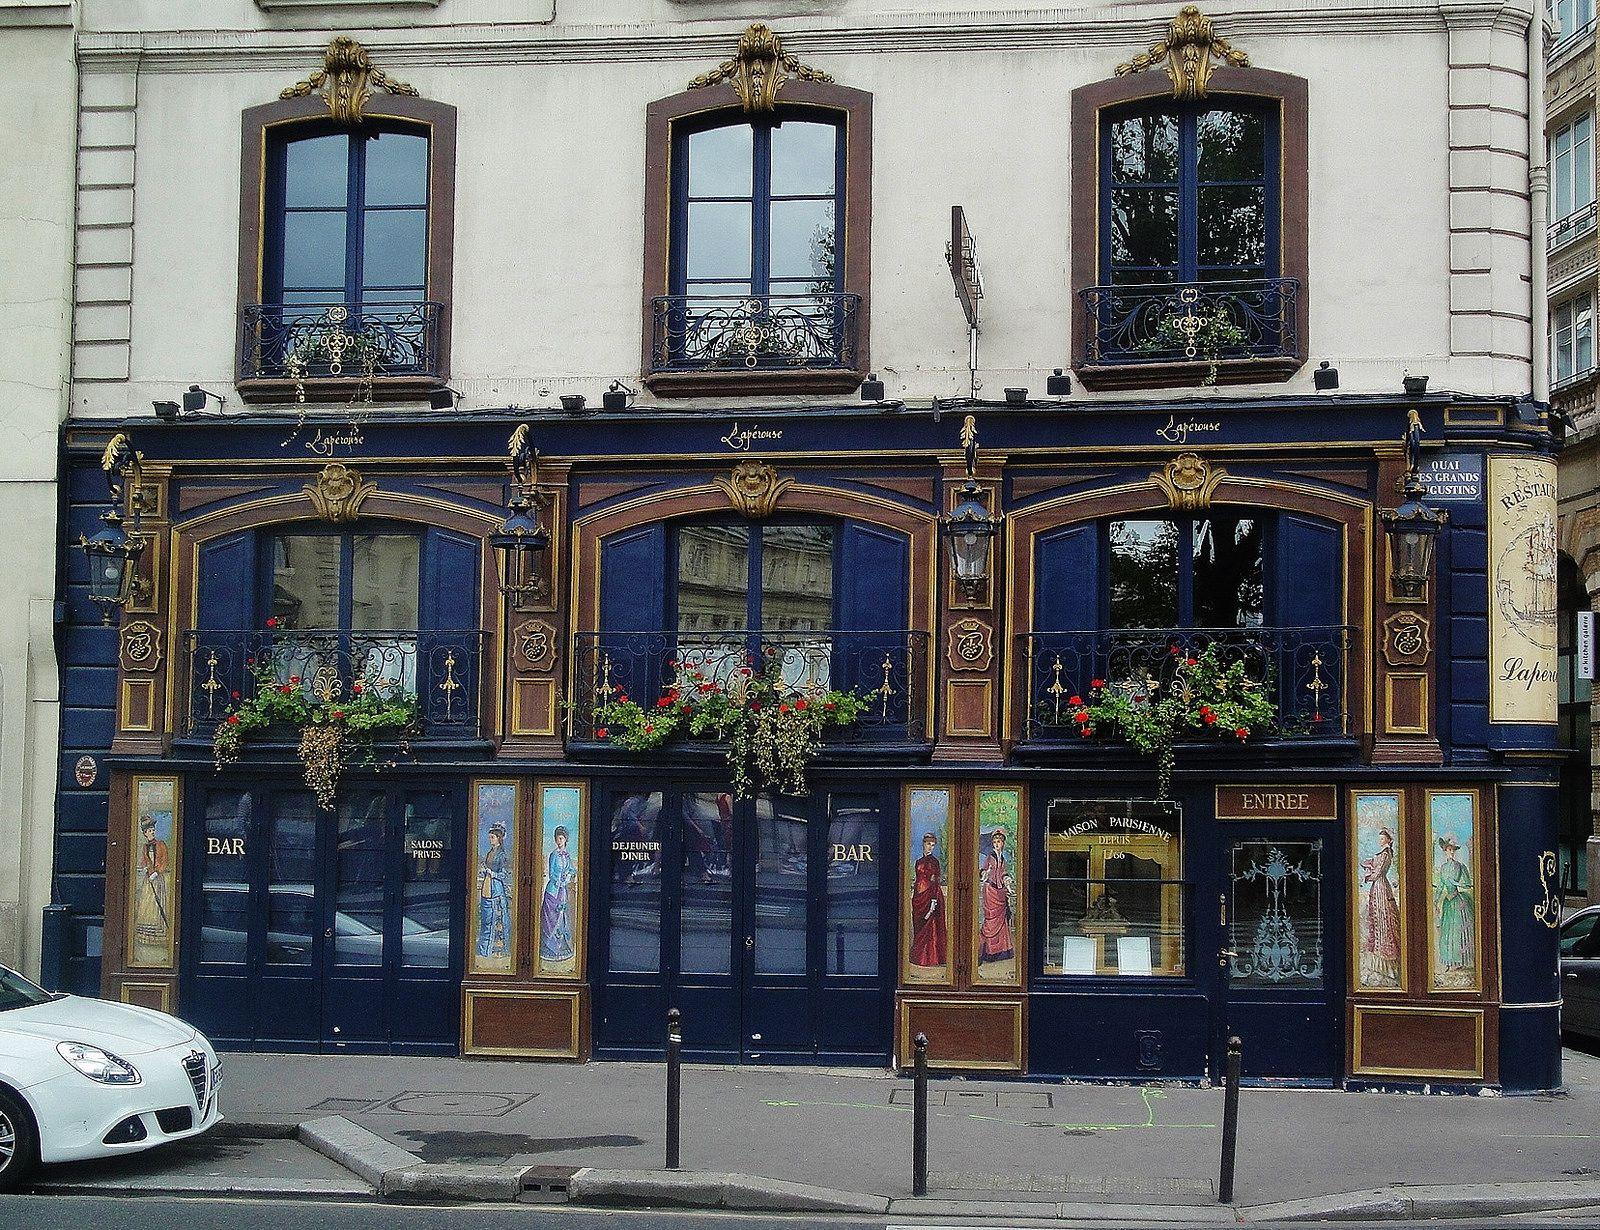 Facade of the Lapérouse historic restaurant, Paris 6th ✯ ωнιмѕу ѕαη∂у